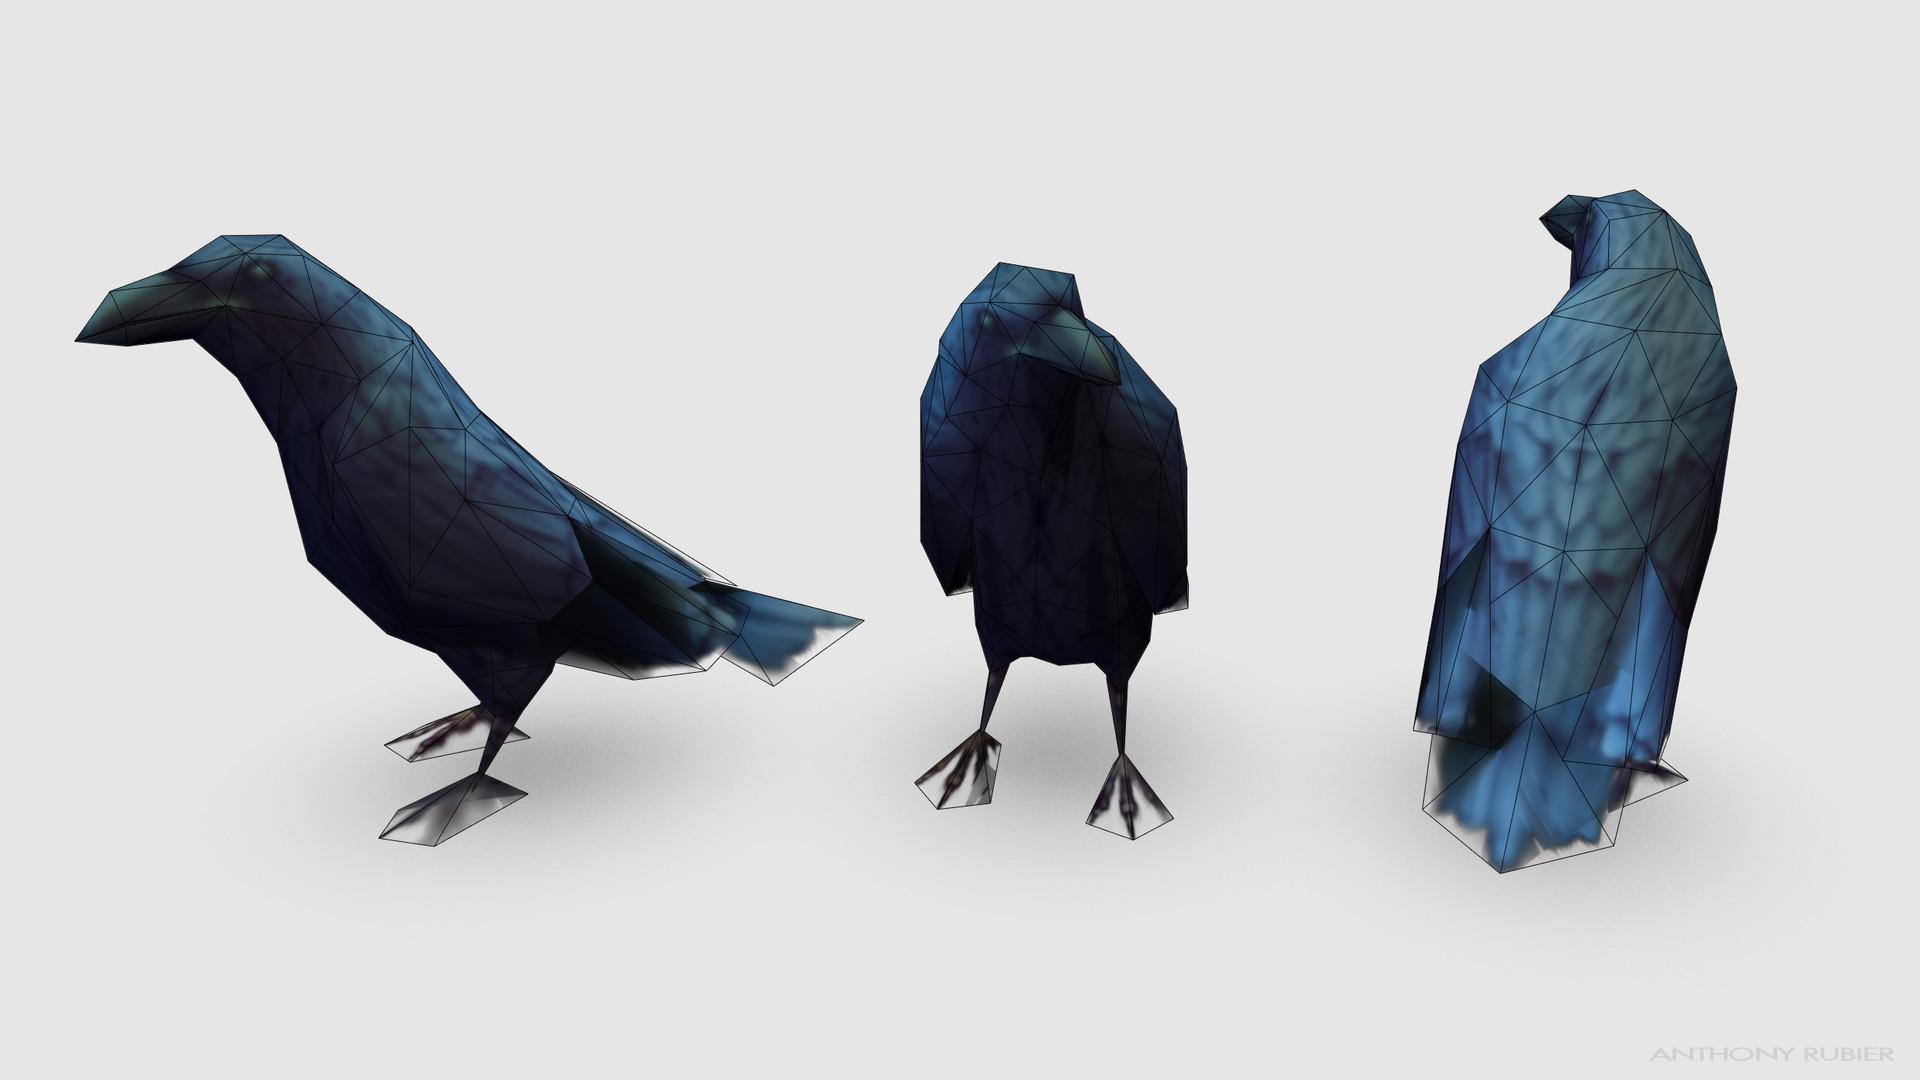 Anthony rubier render mesh corbeau 2